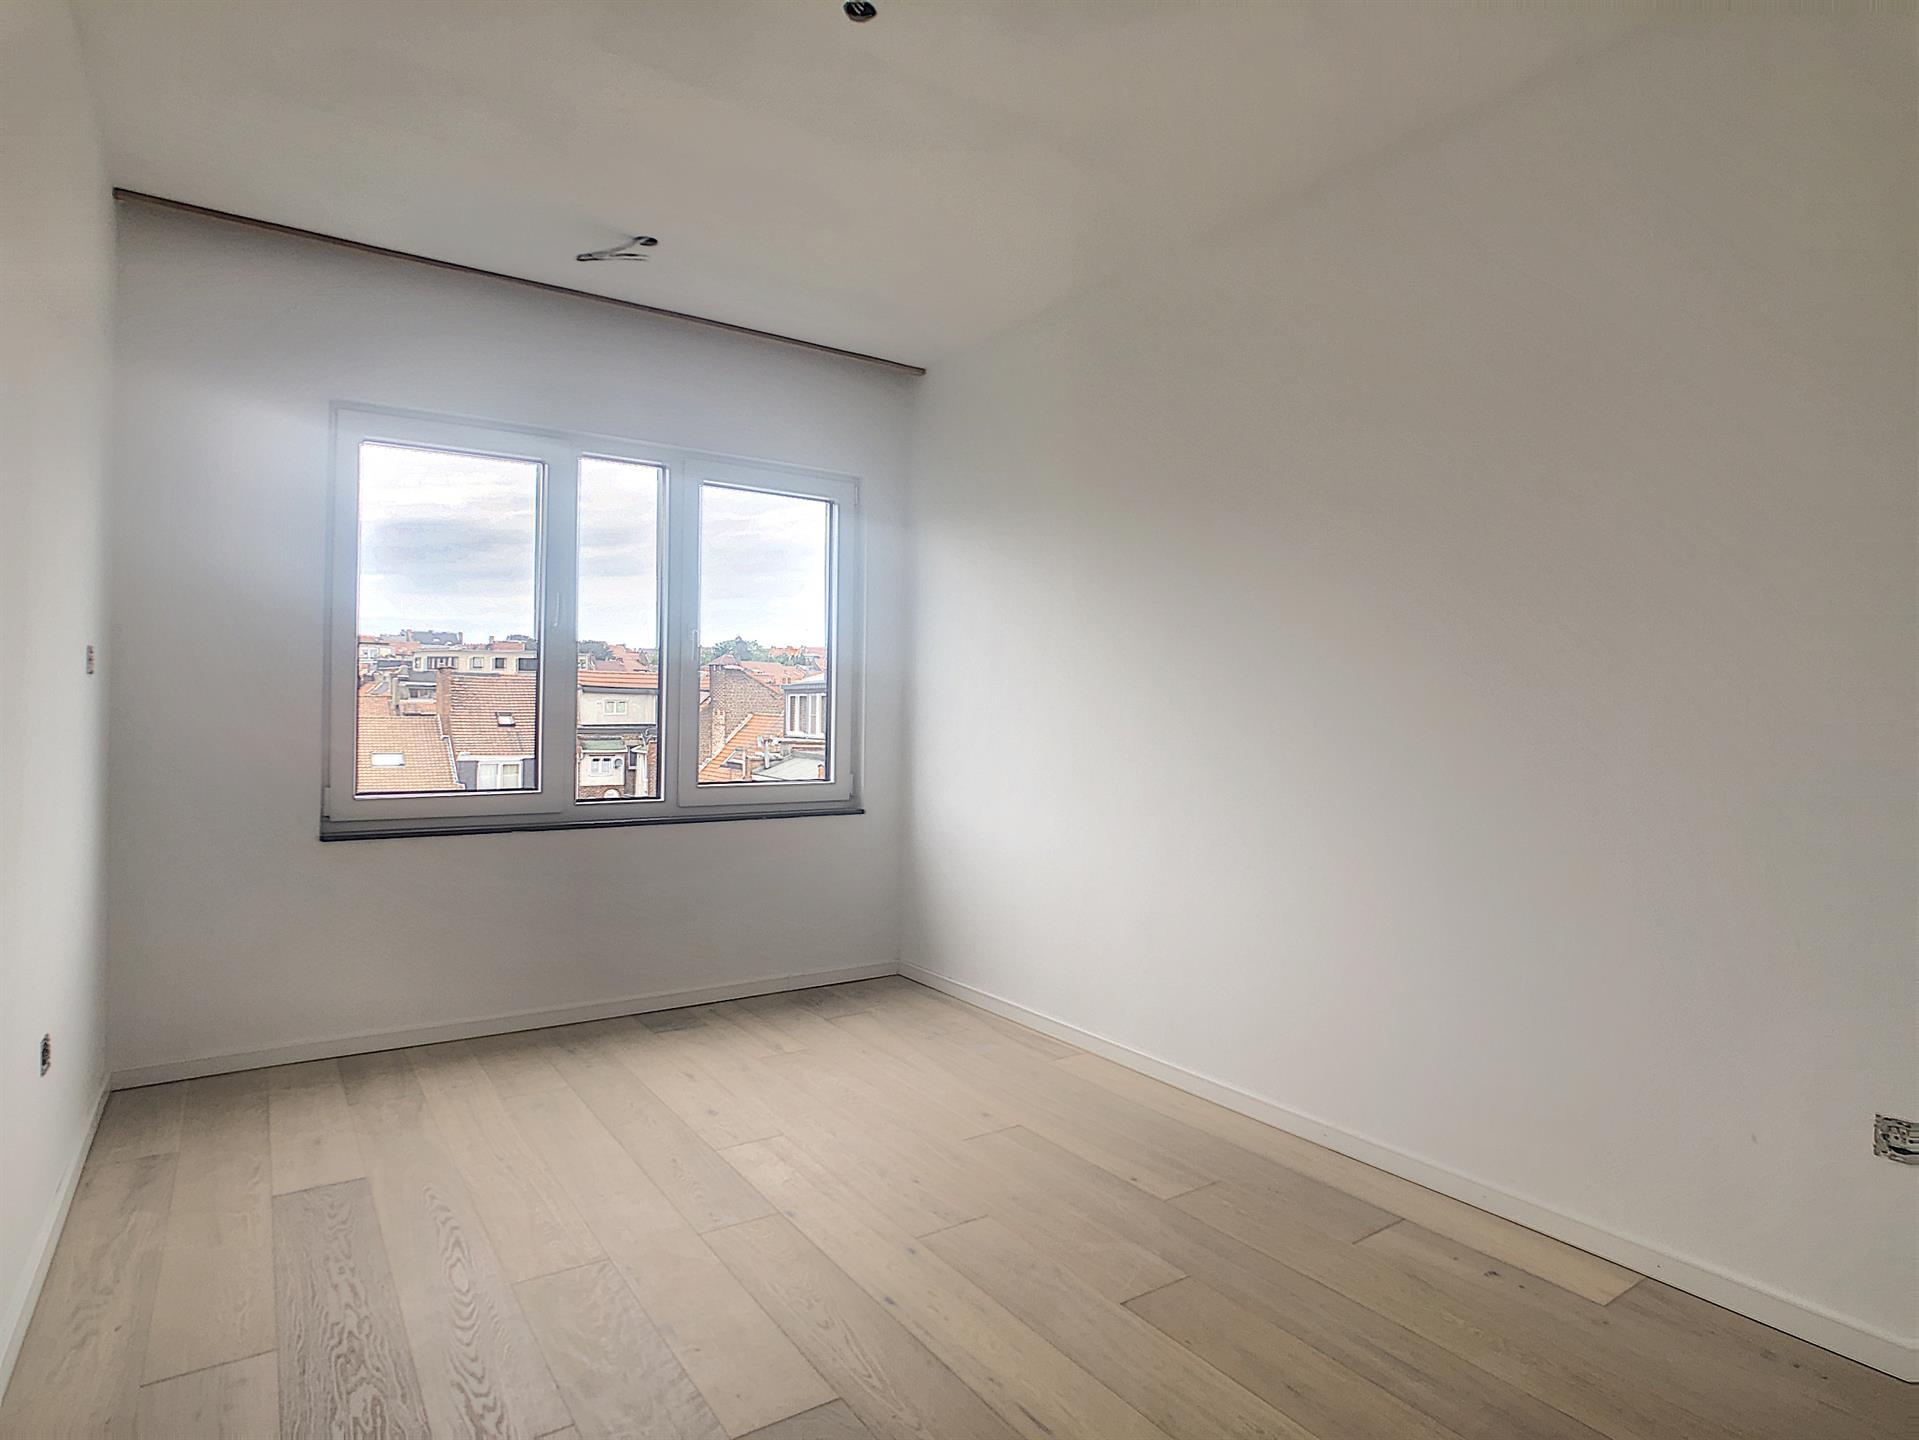 Appartement - Anderlecht - #4252385-38